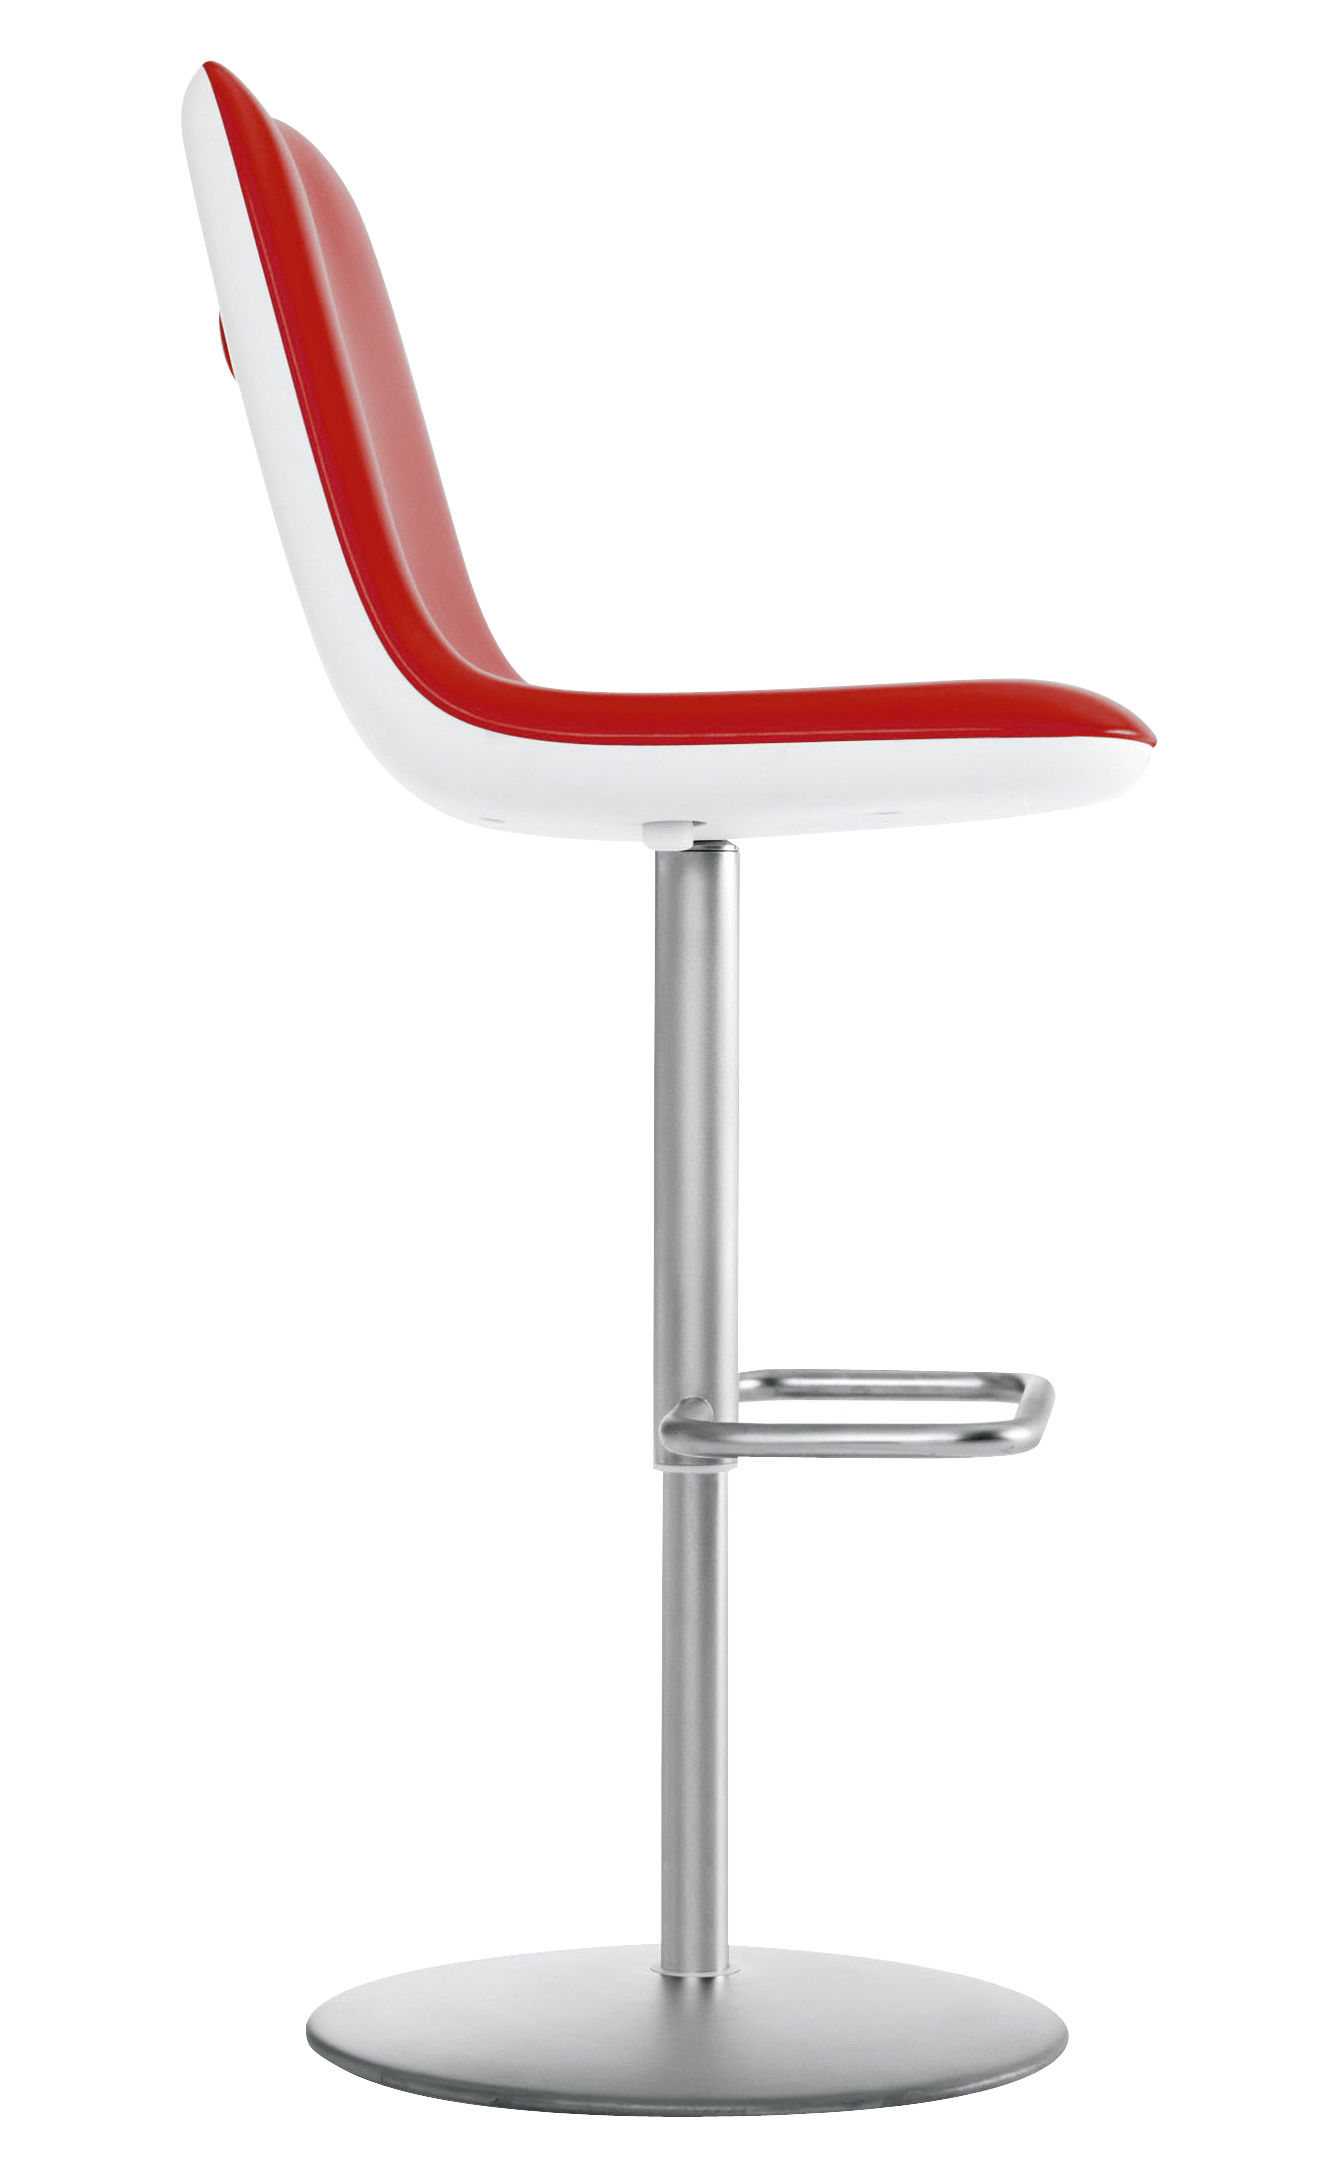 tabouret haut r glable boum assise tissu rembourr e rouge kristalia. Black Bedroom Furniture Sets. Home Design Ideas